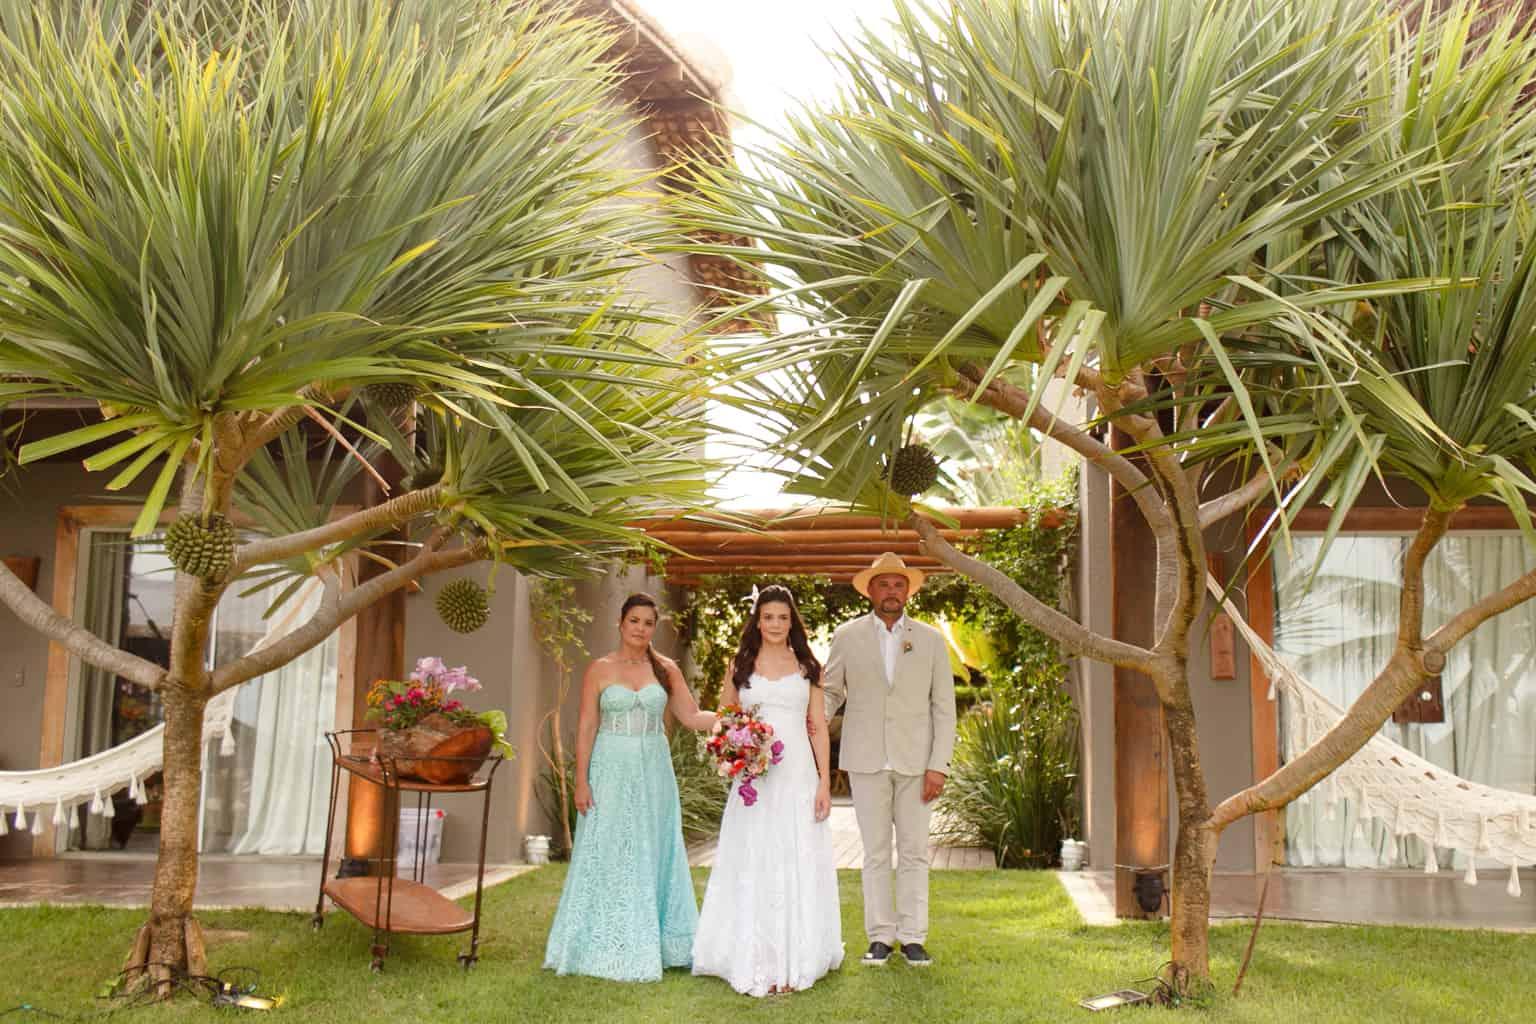 Casamento-Emanuelle-e-Alysson-Fotografia-Tadeu-Nanó-e-Luca-Antunes72